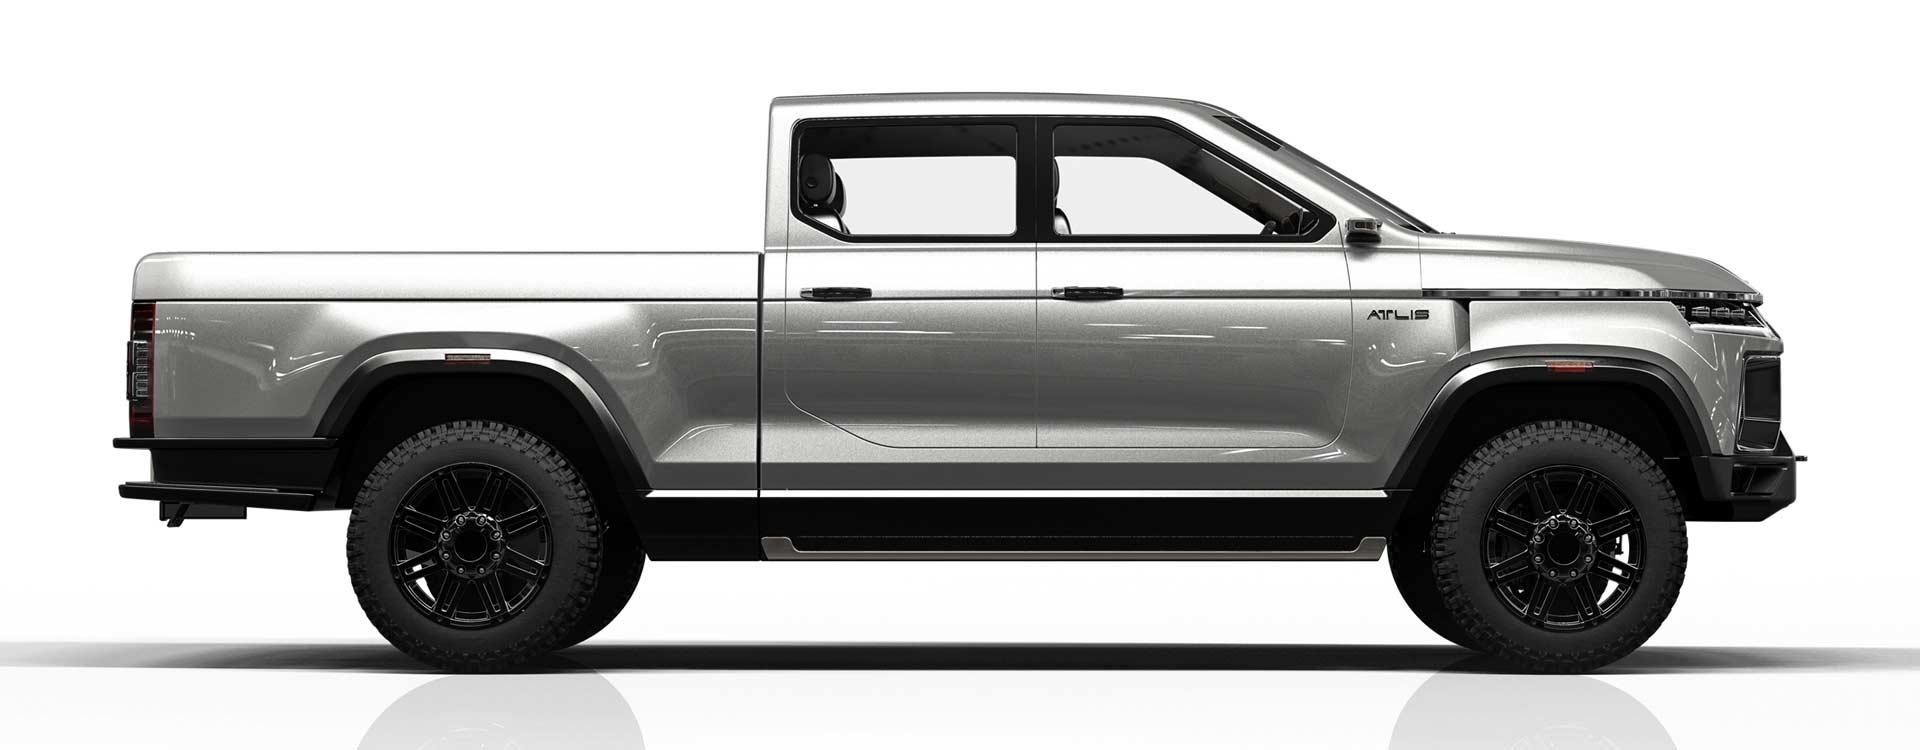 Atlis-XT-Electric-Pickup-Truck-Side-View